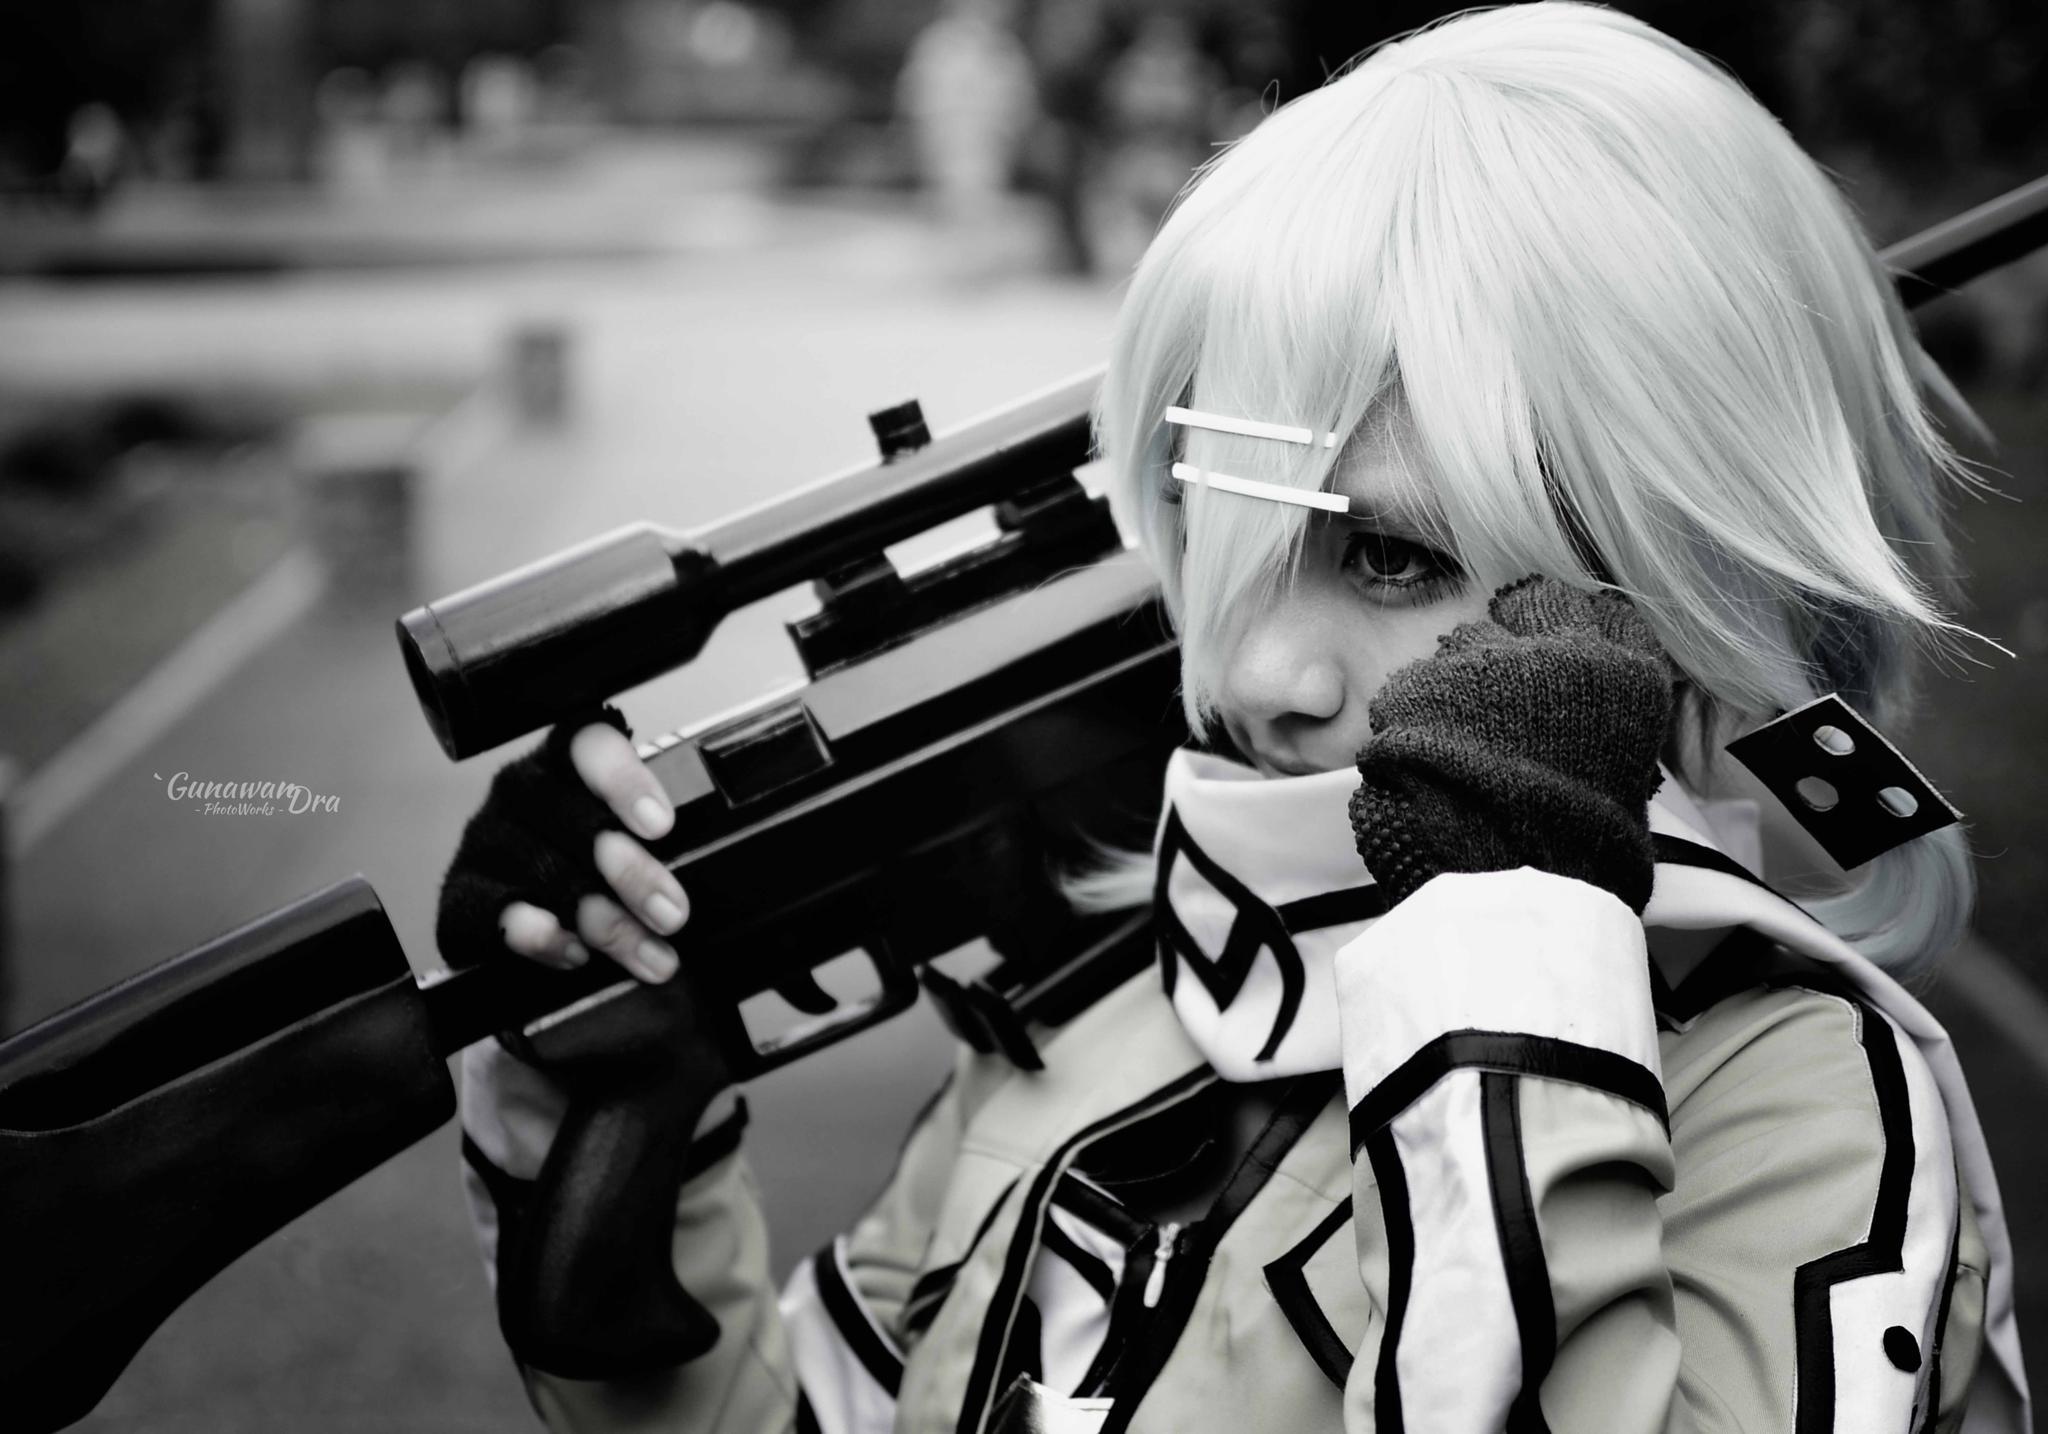 sniper by Gunawandra